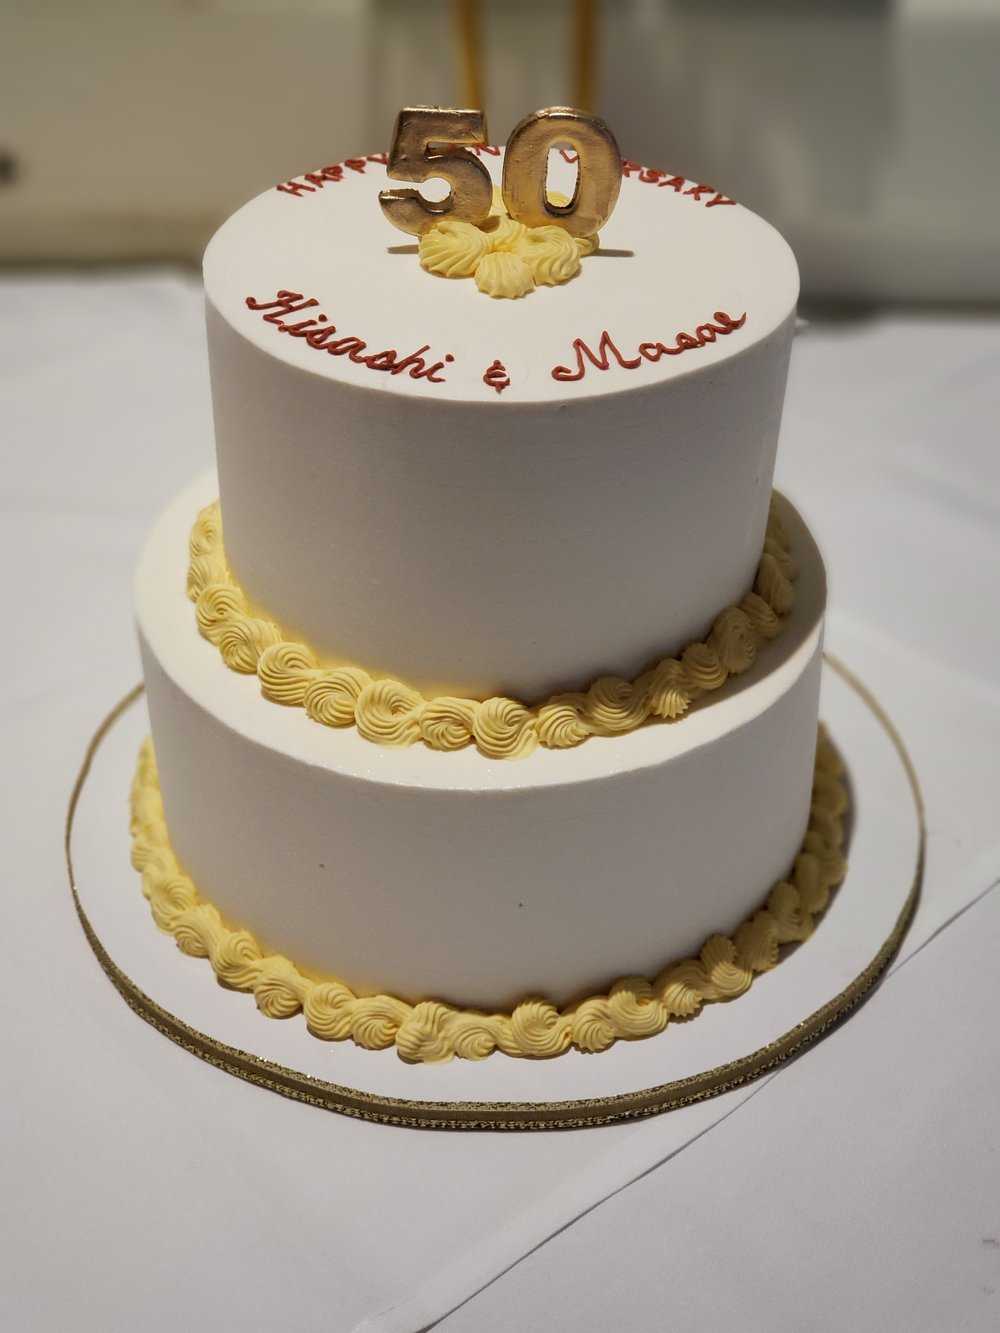 Two tier buttercream 50th anniversary cake with gold 50 topper Hilo Hawaii Big Island Kailua-Kona